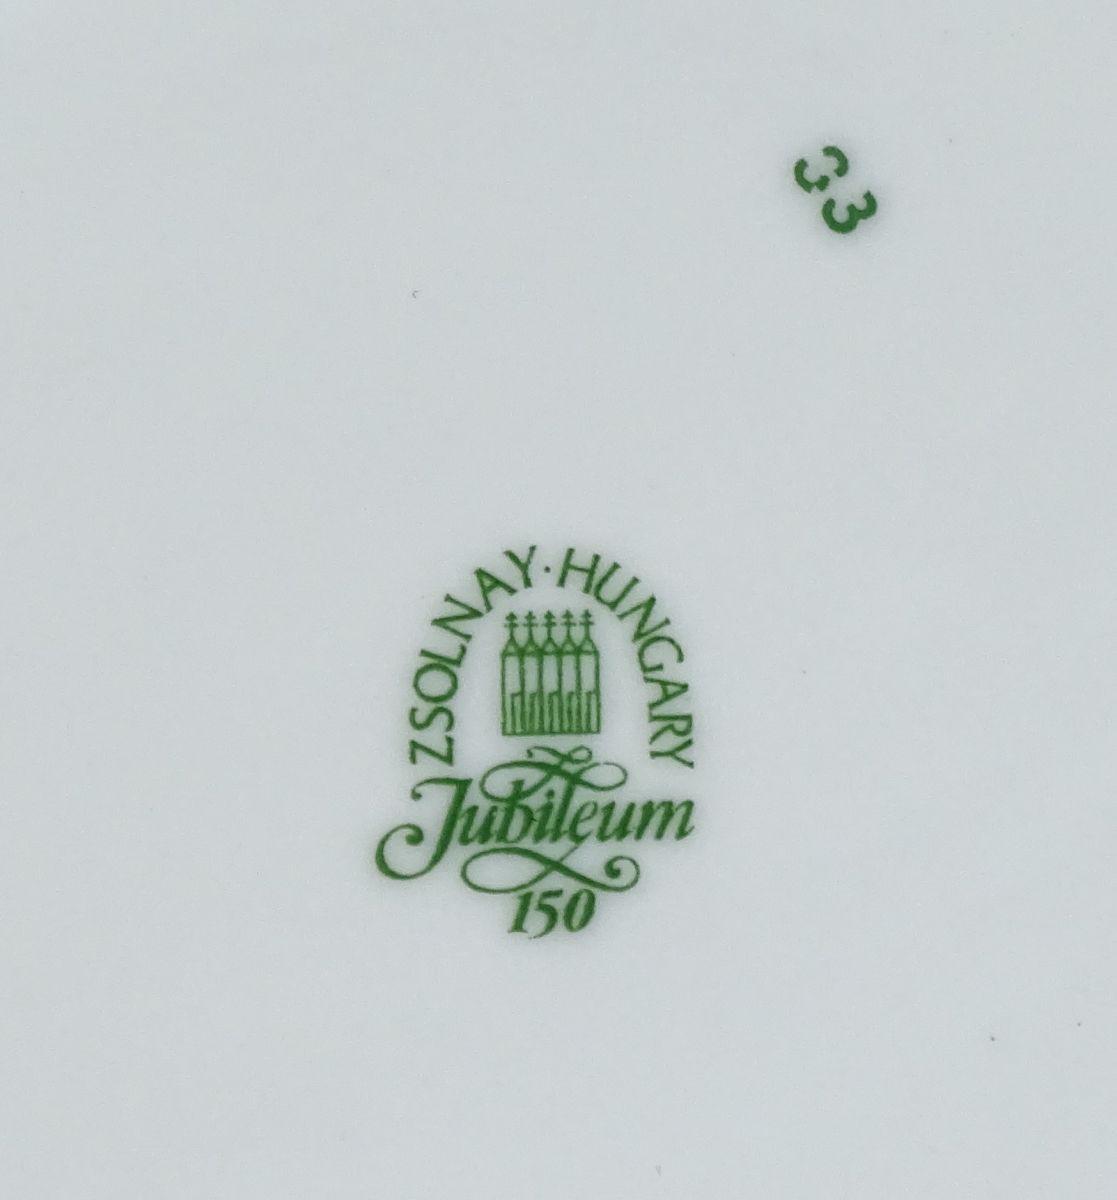 DSC09283.JPG (1117×1200)